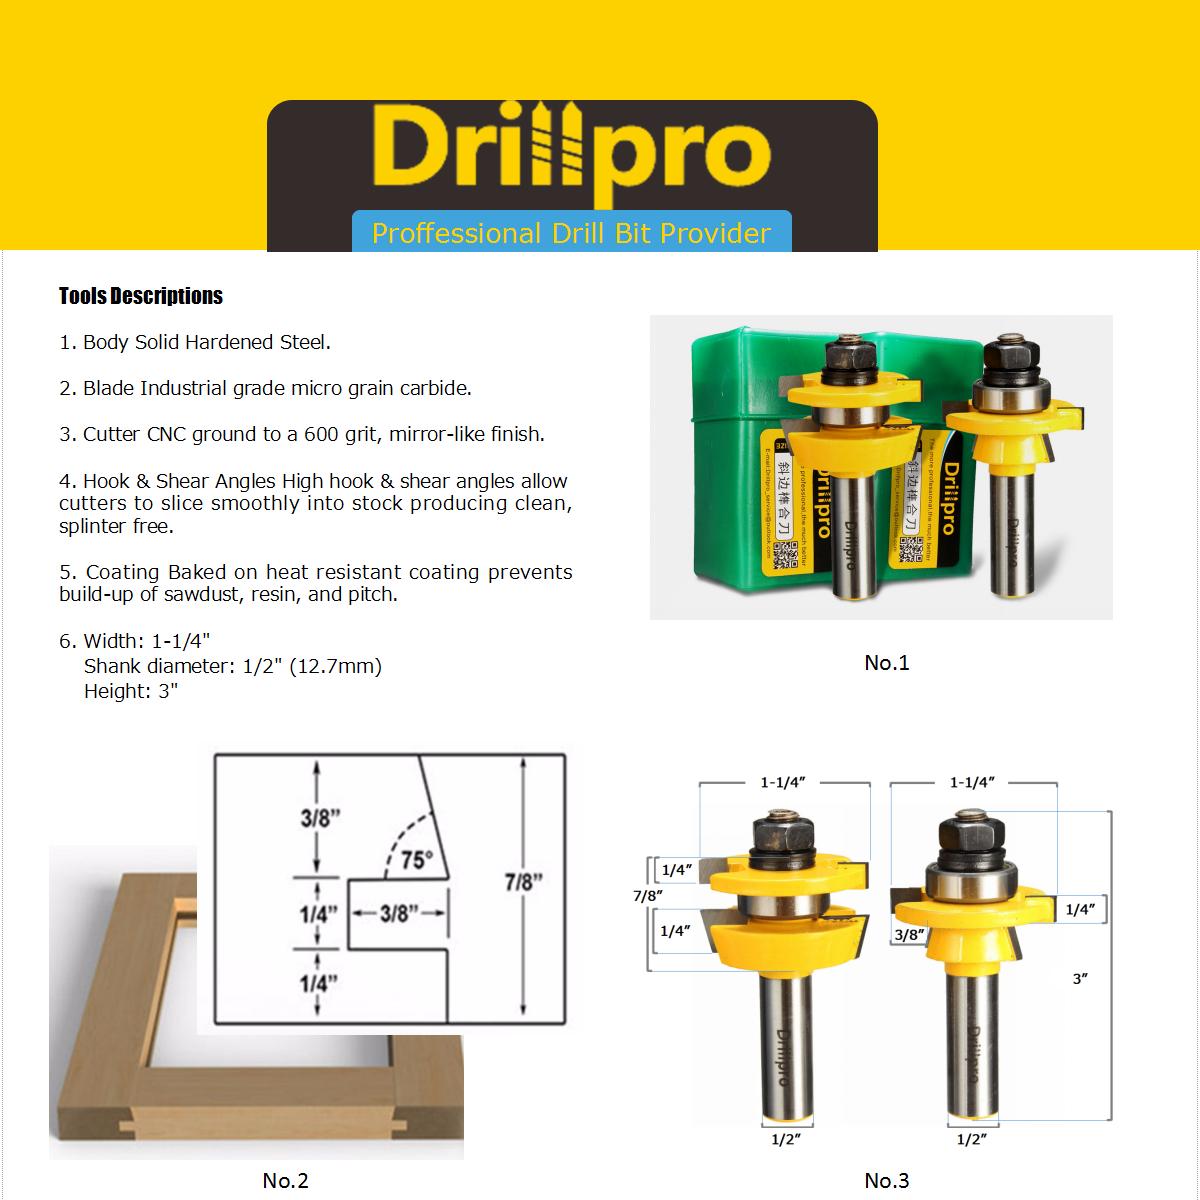 drillpro router bit product discription